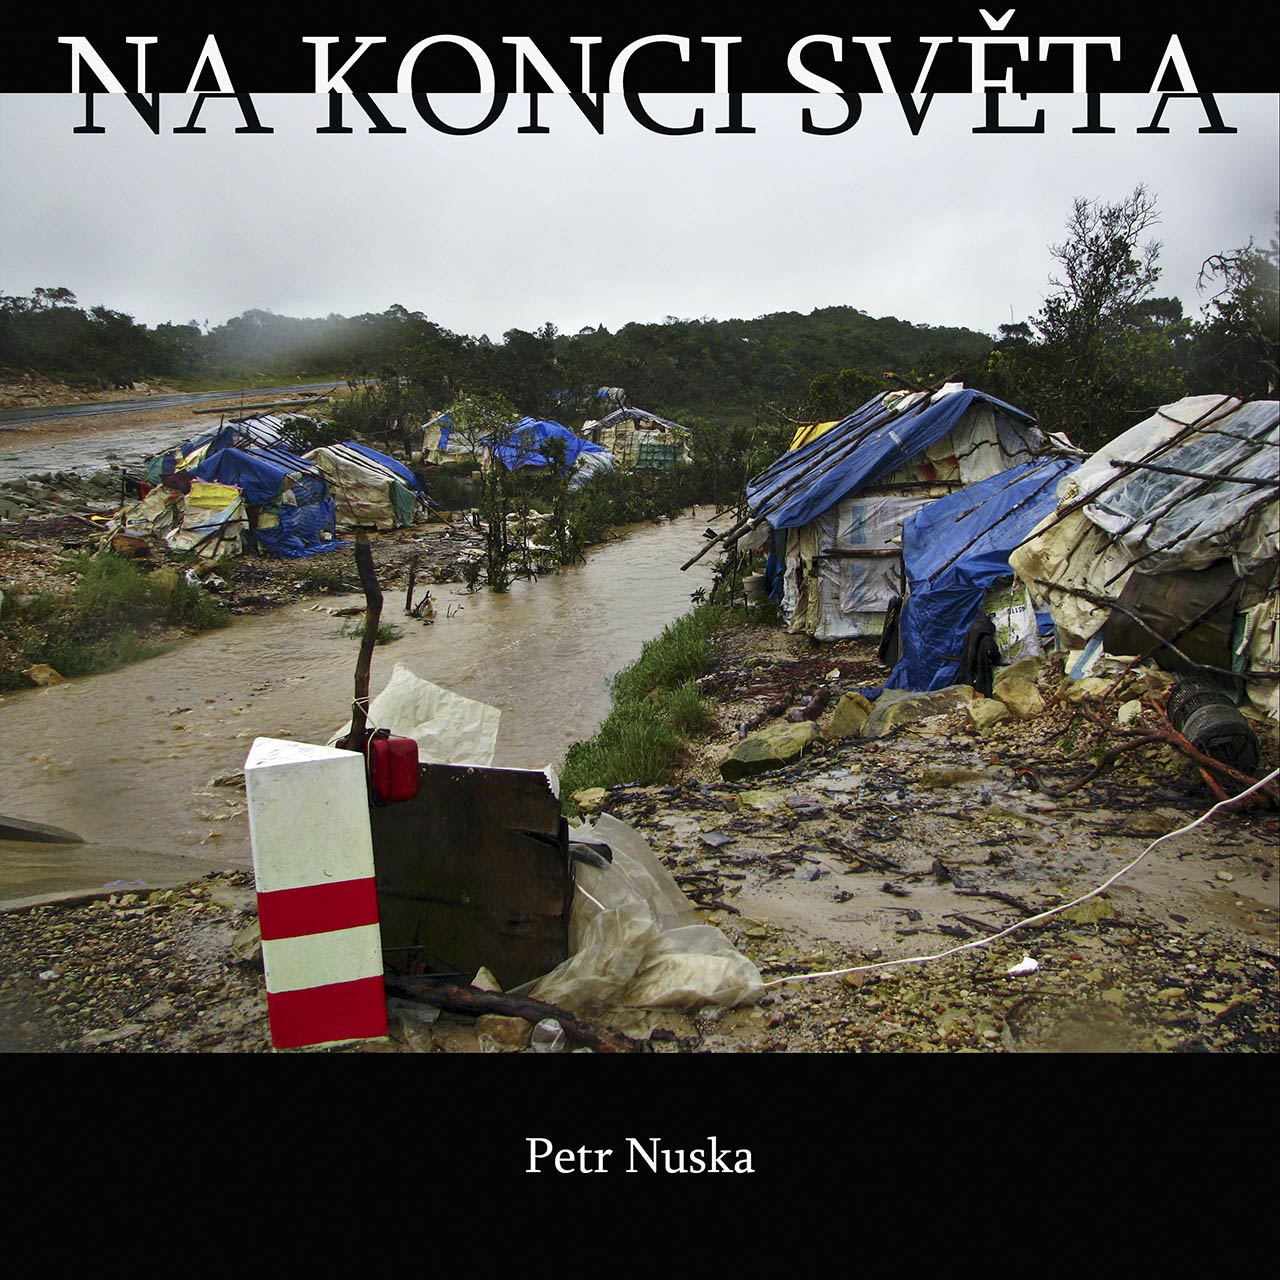 Škatulka: Bokor : Na konci světa (reportáž) // Petr Nuska - Fotografie - woreshack.cz